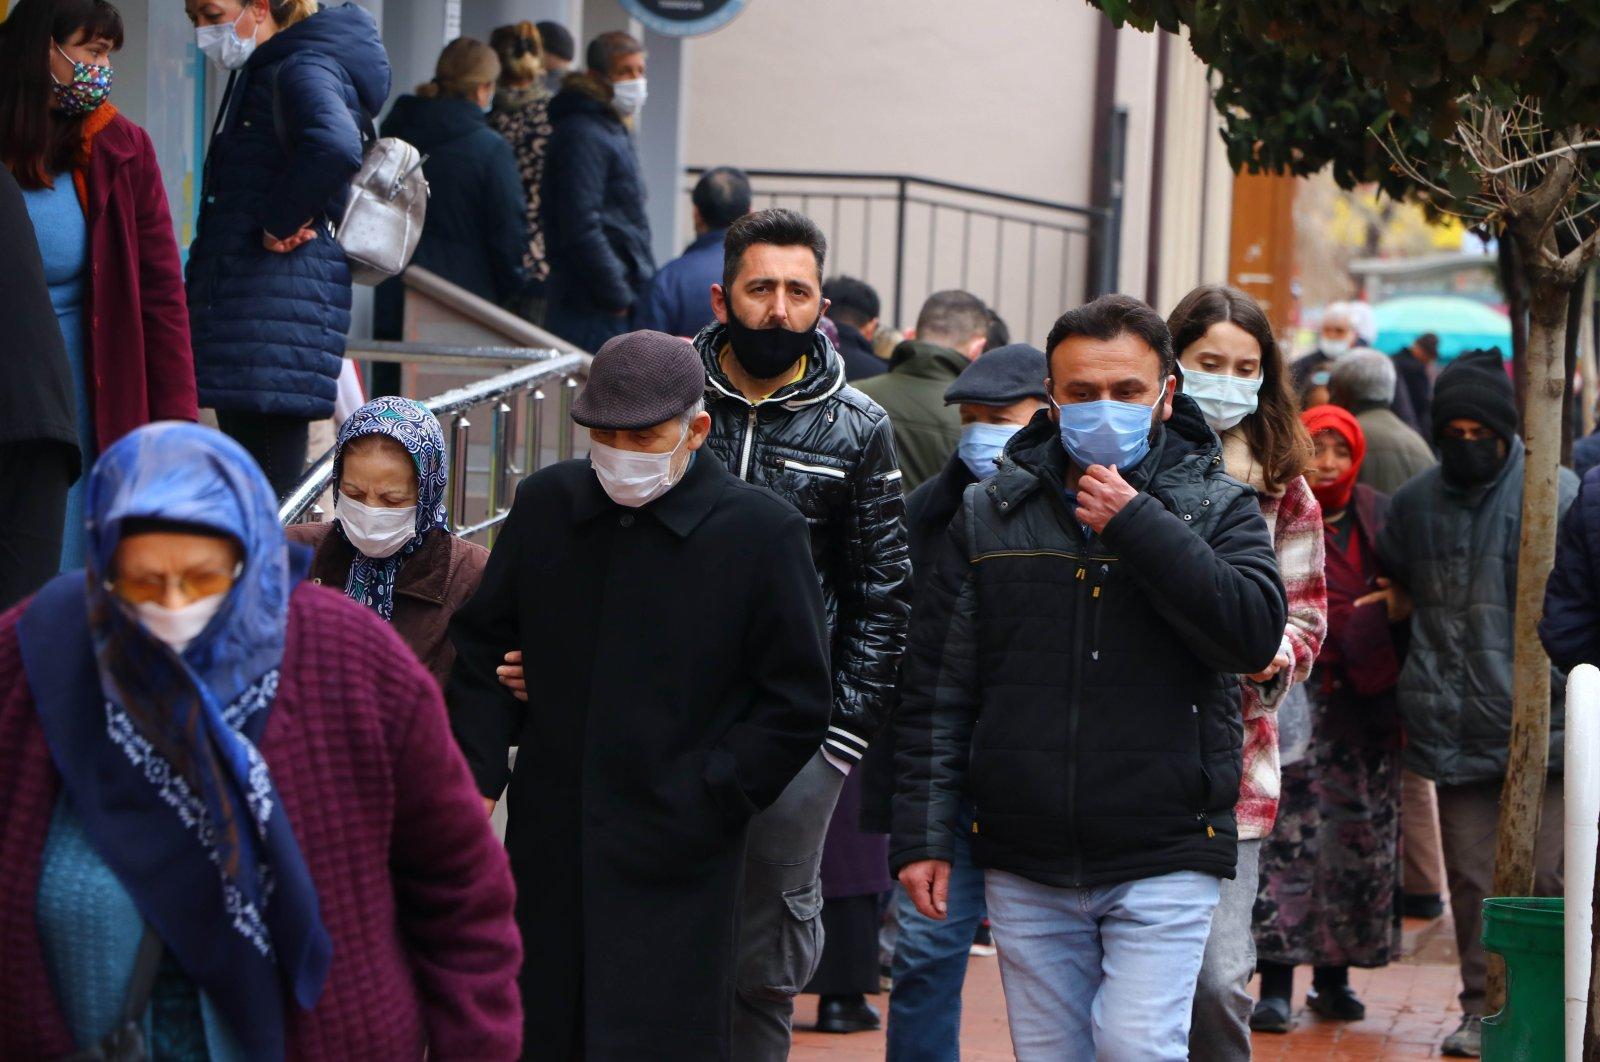 People wearing protective masks walking on a street in Tekirdağ, northwestern Turkey, April 5, 2021. (AA PHOTO)